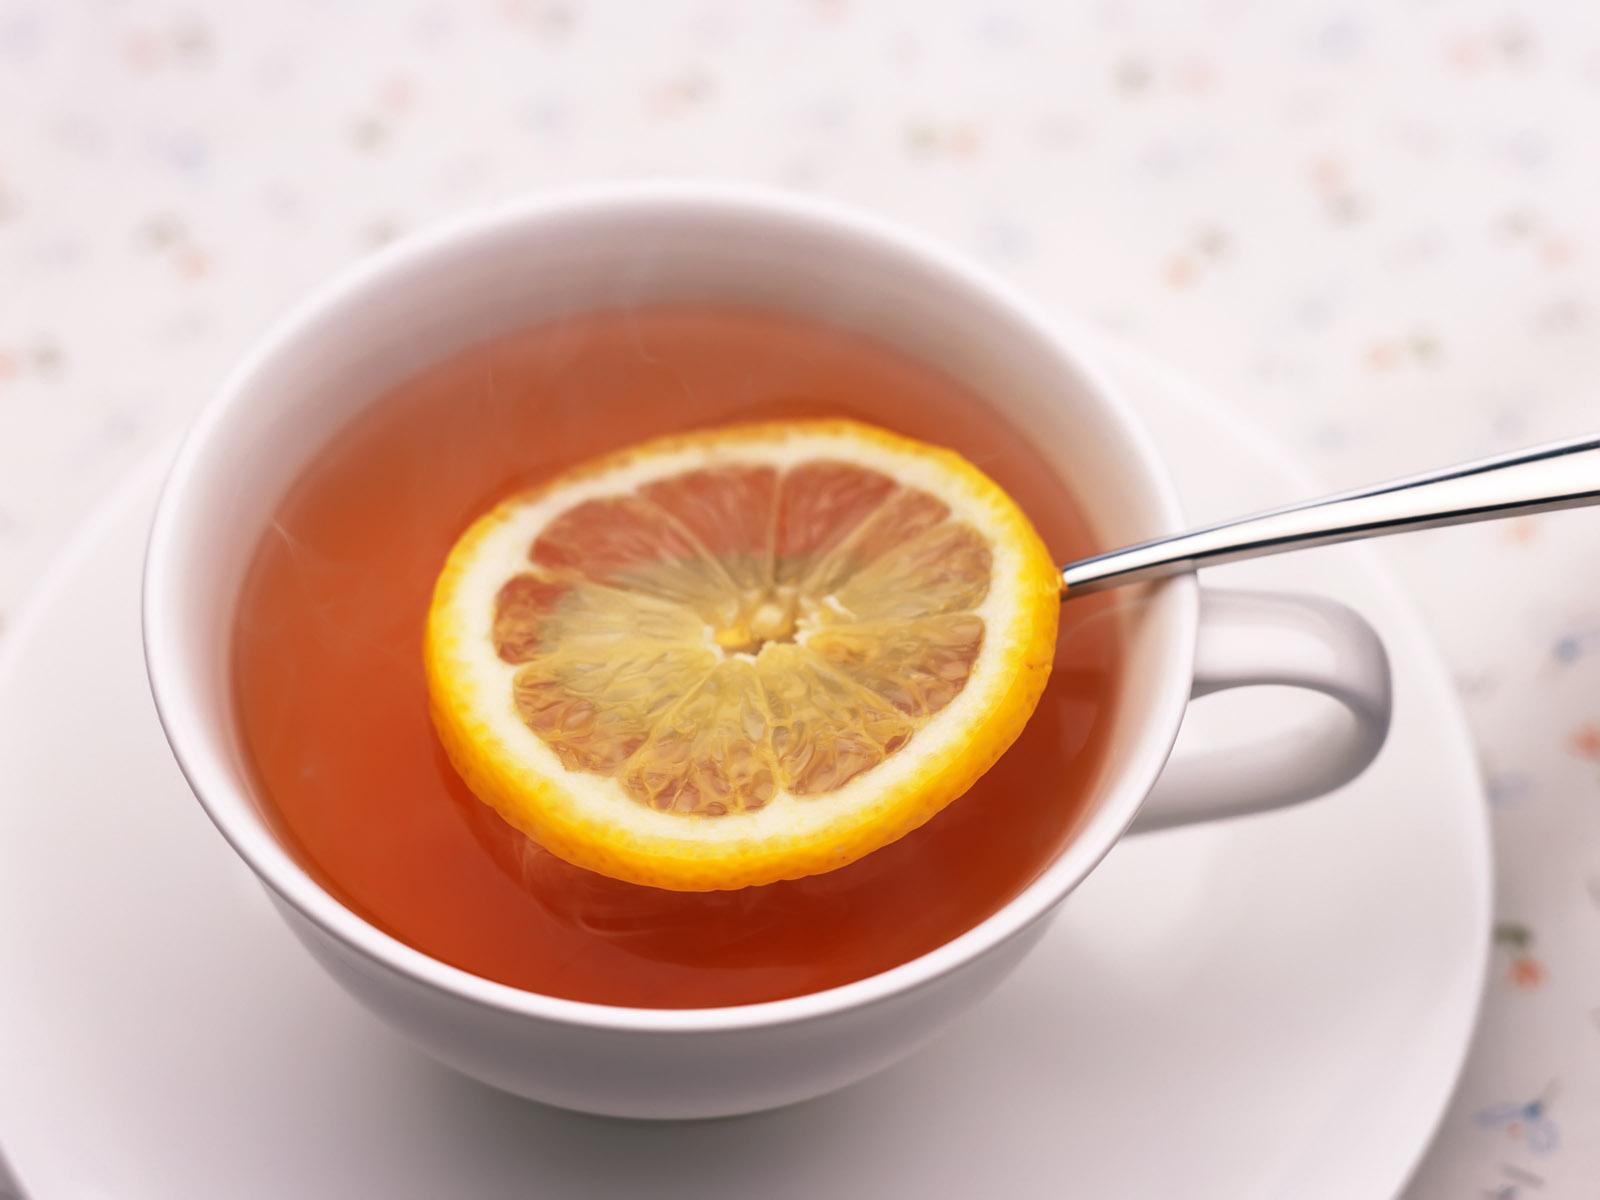 представлен картинка кружка чая с лимоном тех пор амеба